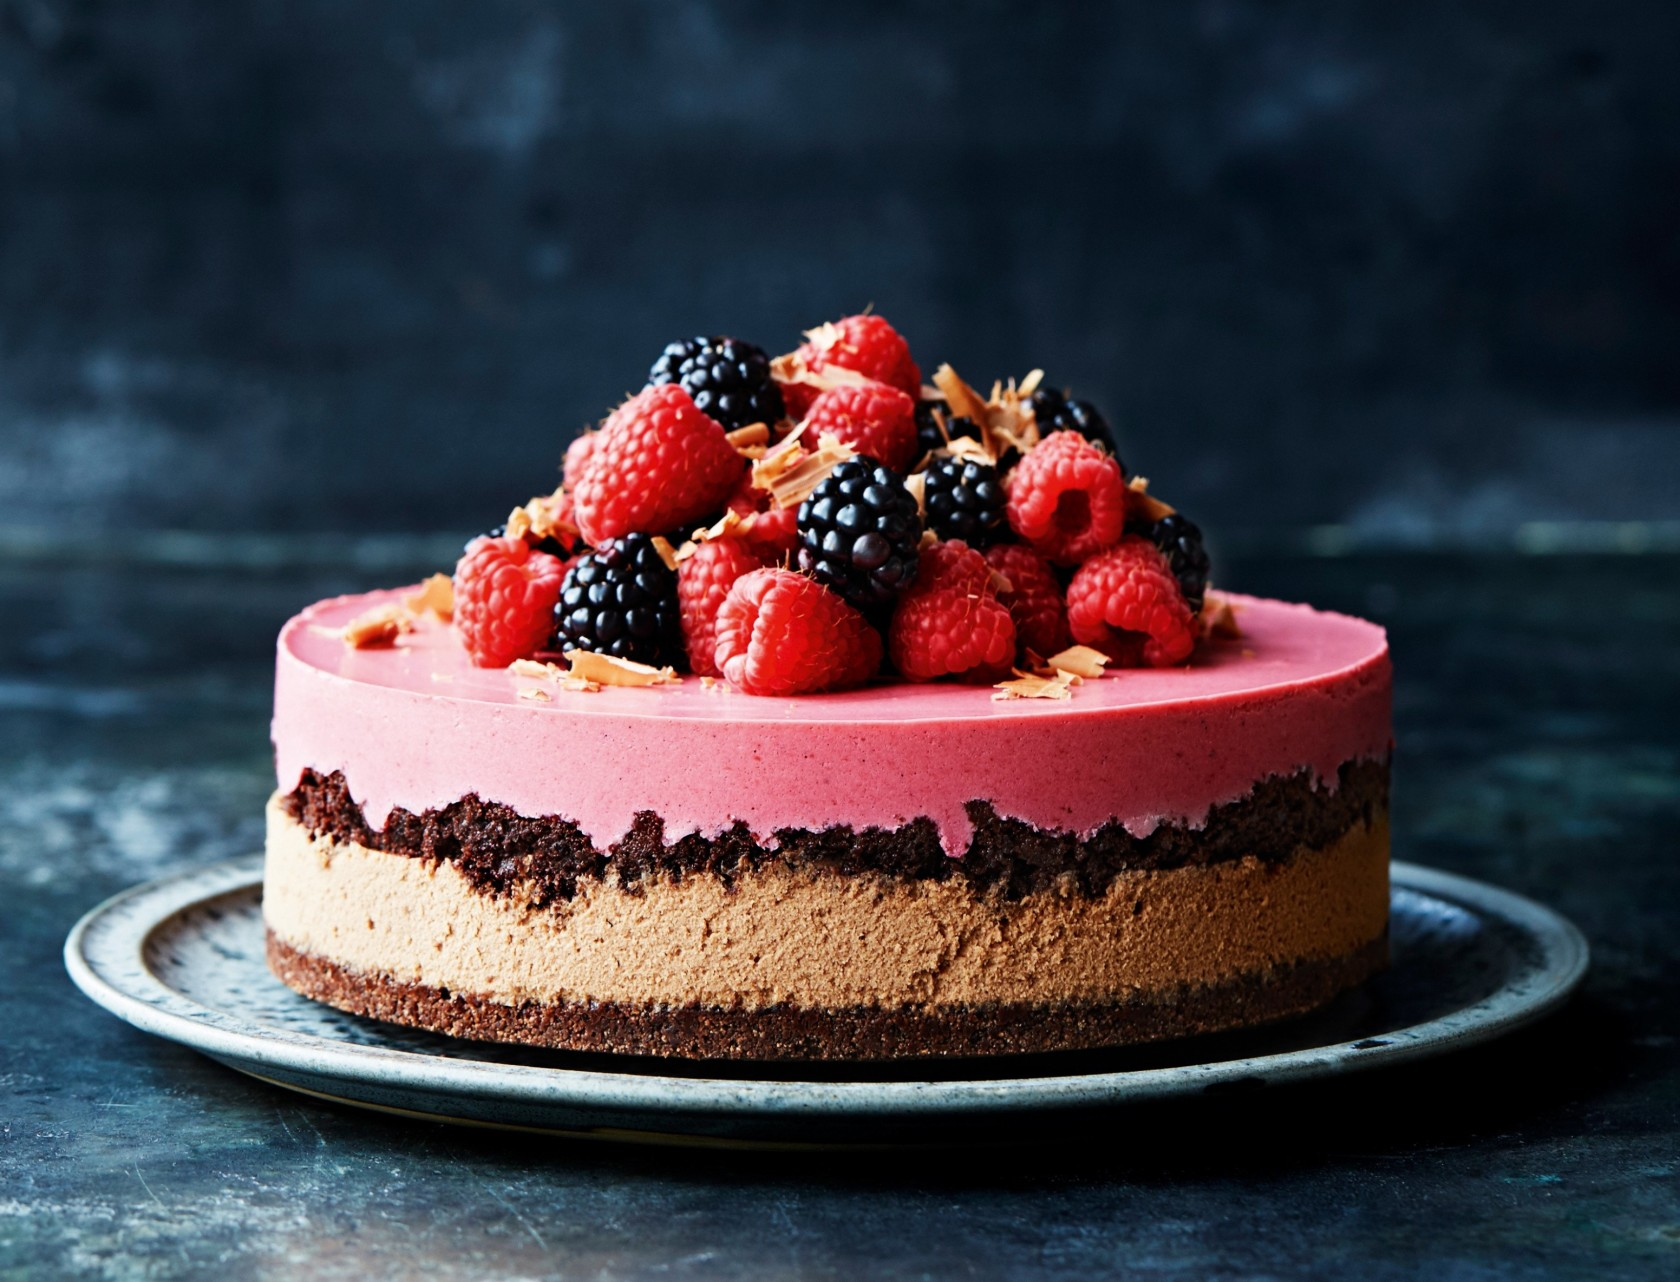 Smuk chokoladelagkage med chokolademousse og hindbærmousse